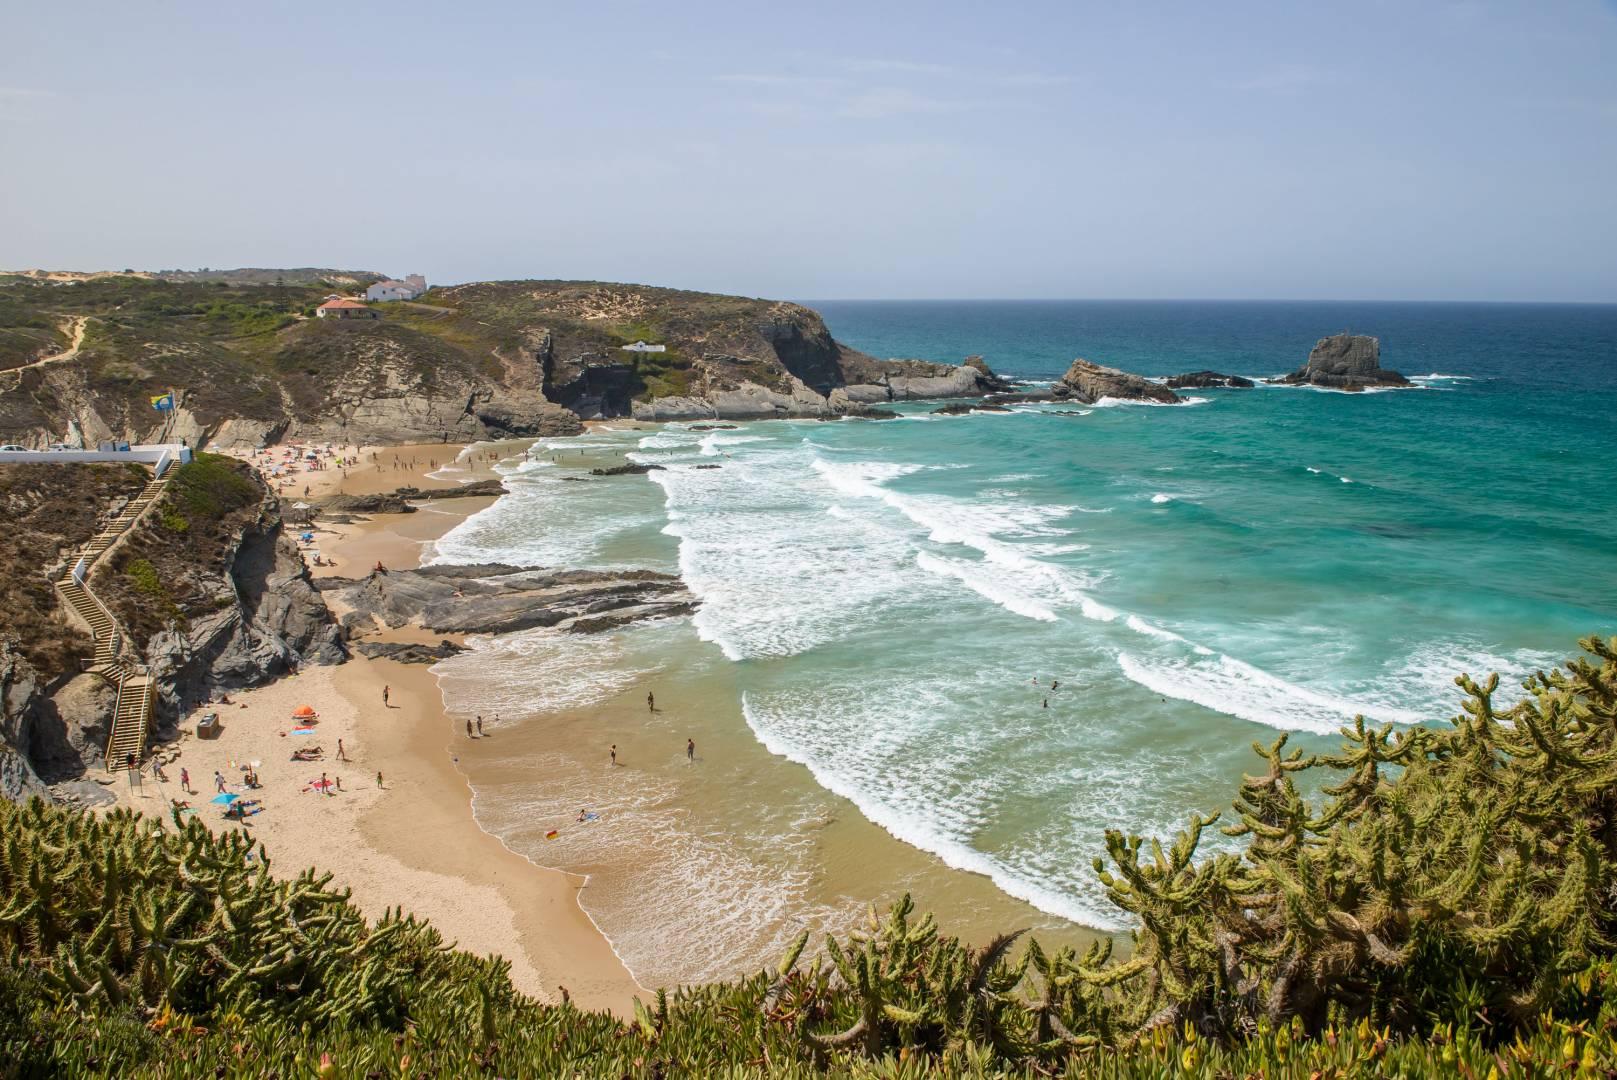 Praia da Zambujeira do Mar - Odemira | All About Portugal